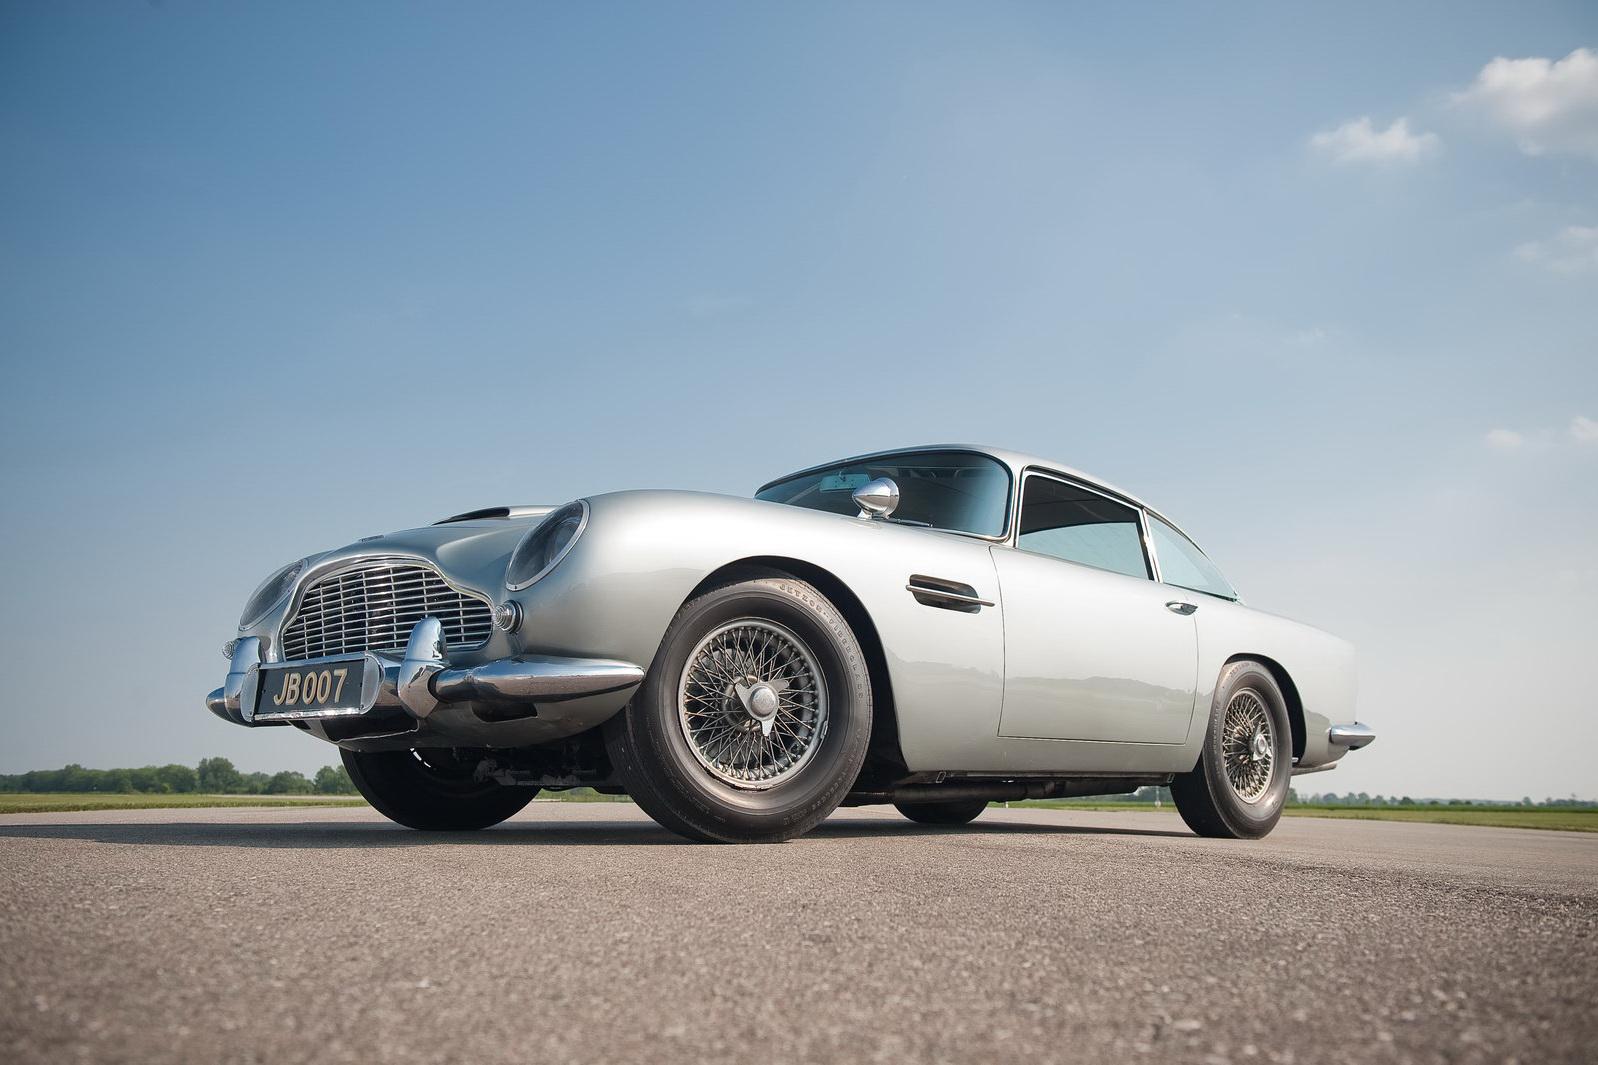 james bond 1964 aston martin db5 111 james bonds original 007 aston. Cars Review. Best American Auto & Cars Review